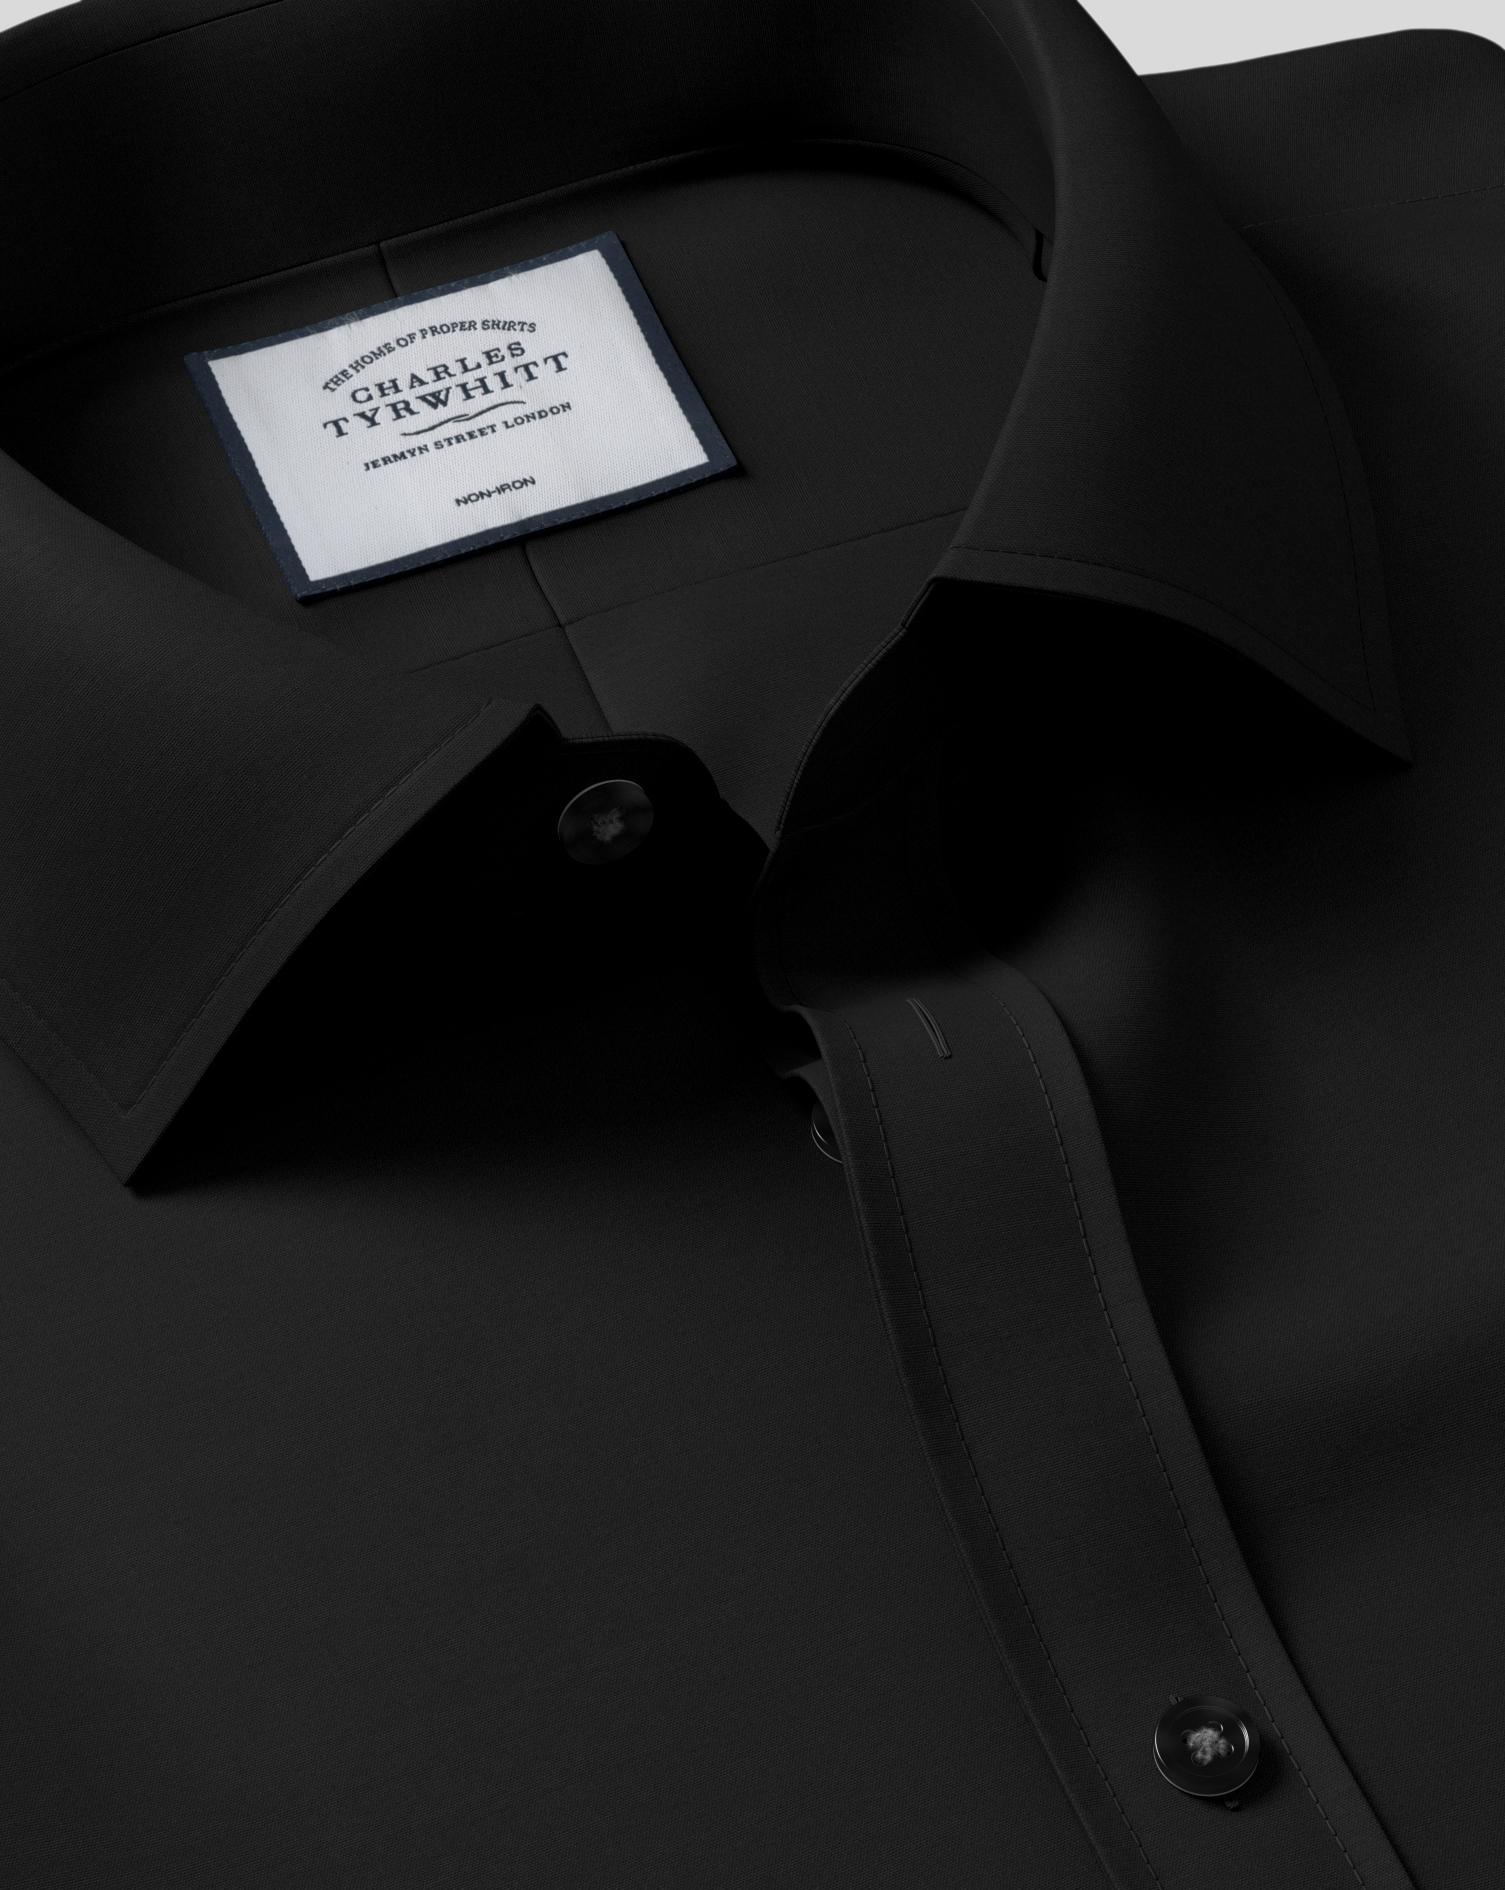 Classic Fit Black Non-Iron Poplin Cotton Formal Shirt Single Cuff Size 15.5/33 by Charles Tyrwhitt